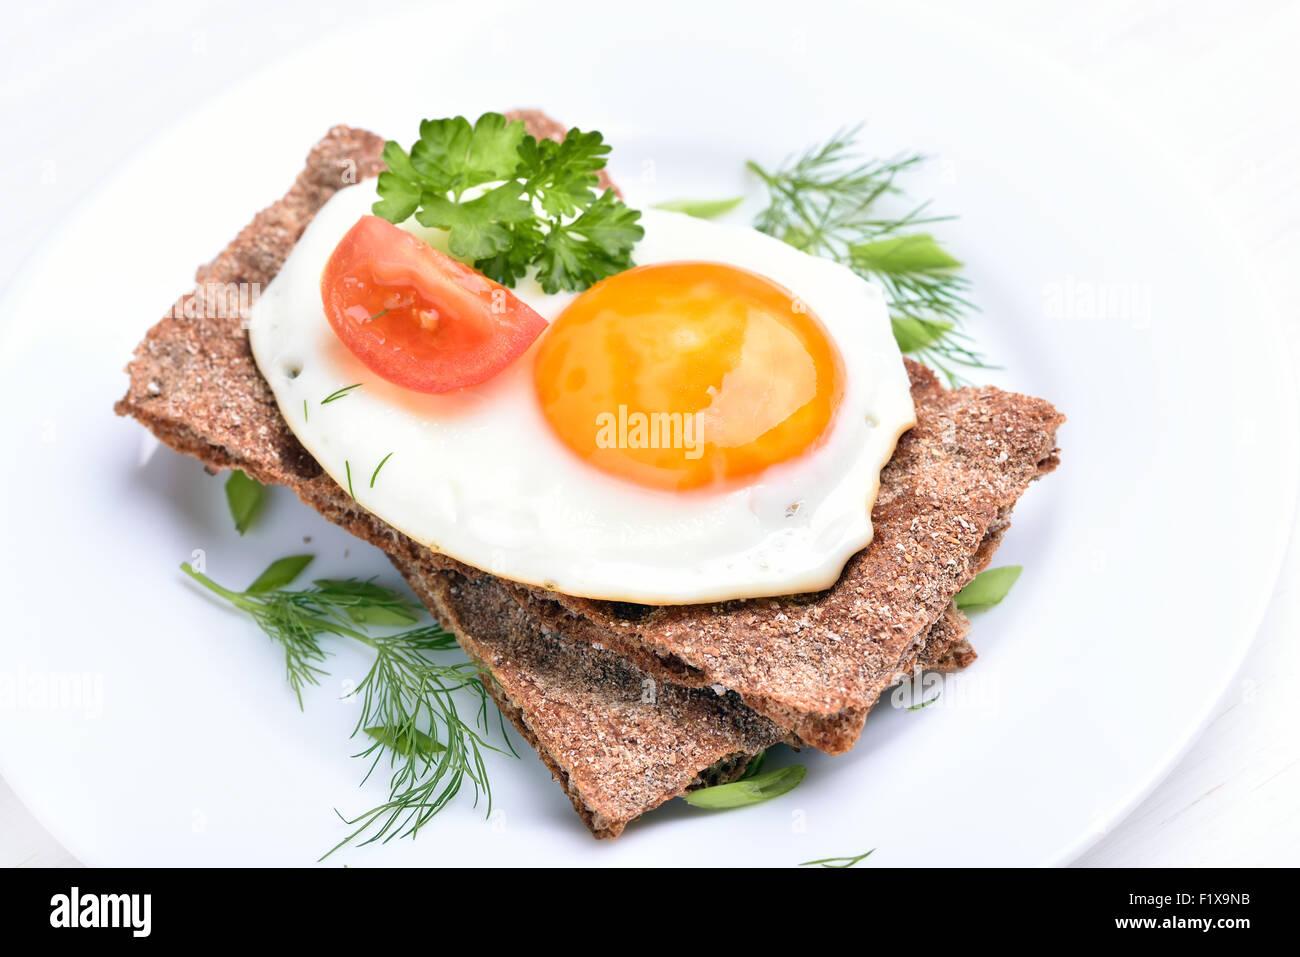 Fried egg, parsley and tomato slice on crispbread - Stock Image